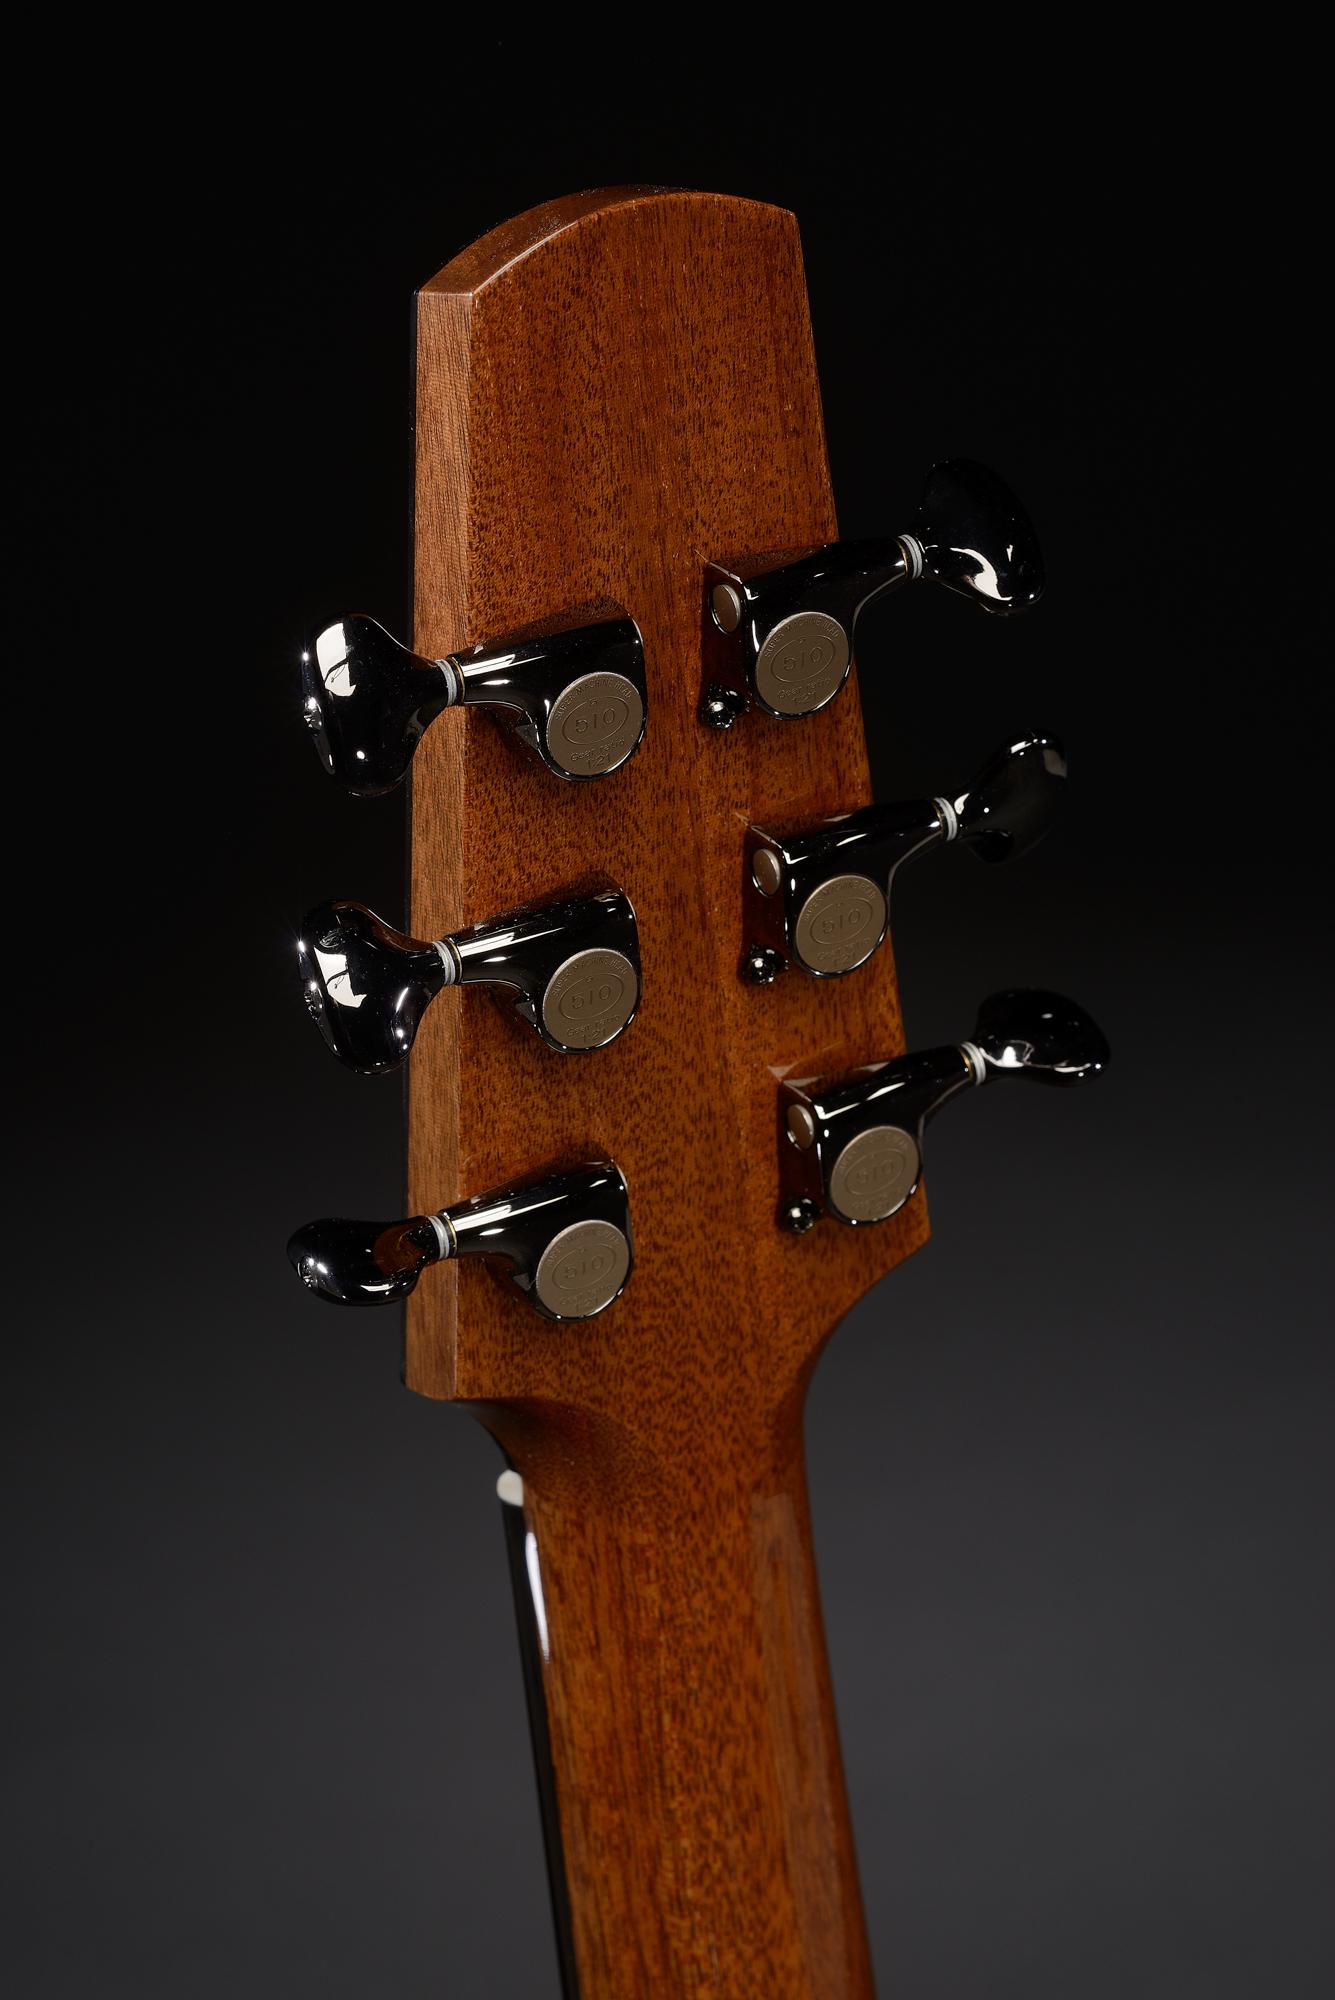 Traugott Model R quilted mahogany guitar